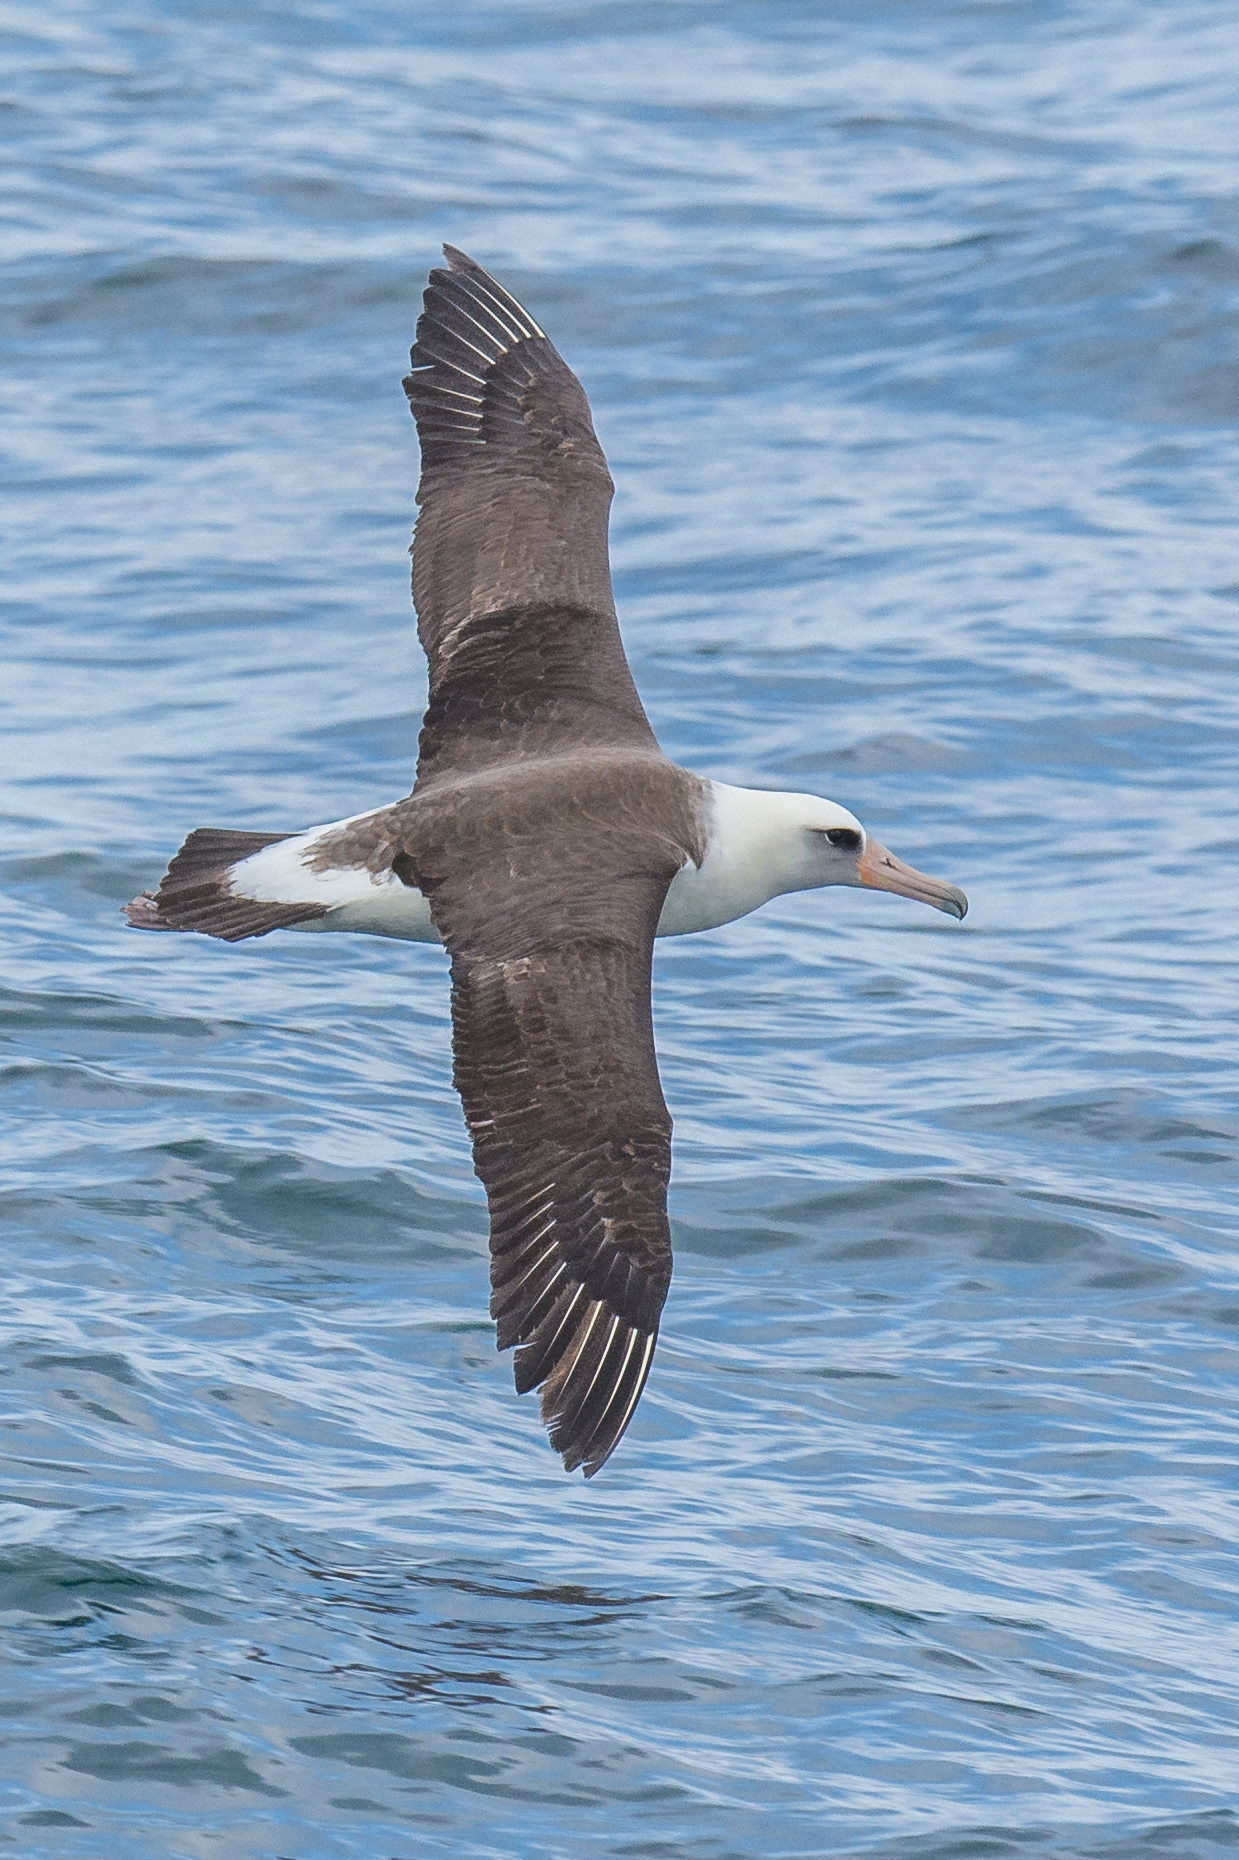 Laysan Albatross (Phoebastria immutabilis), Transit to Zhupanova River, KAM (RU)